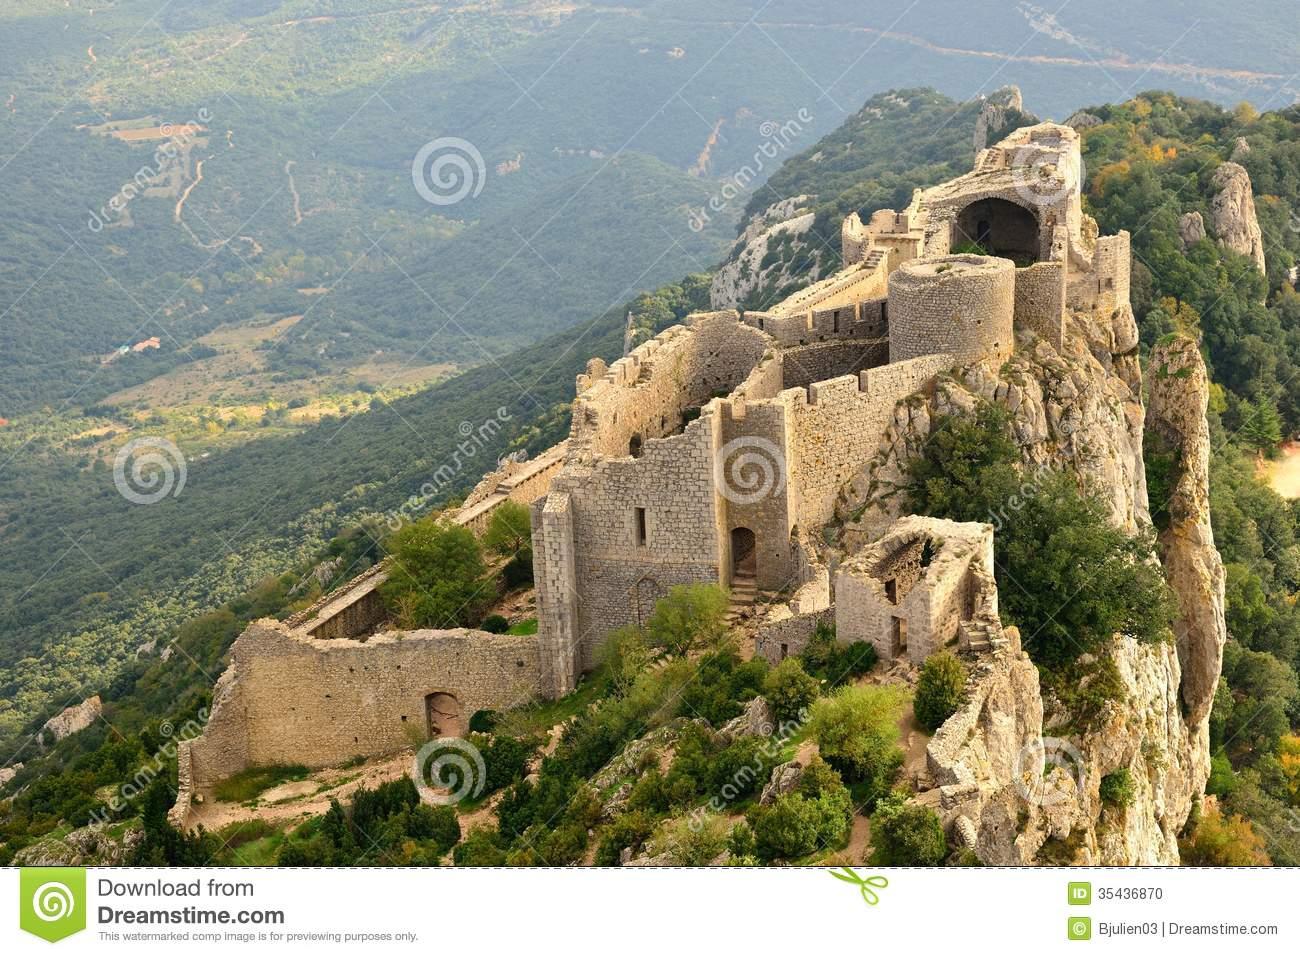 Peyrepertuse Cathar Castle Seen From Above Stock Photo.